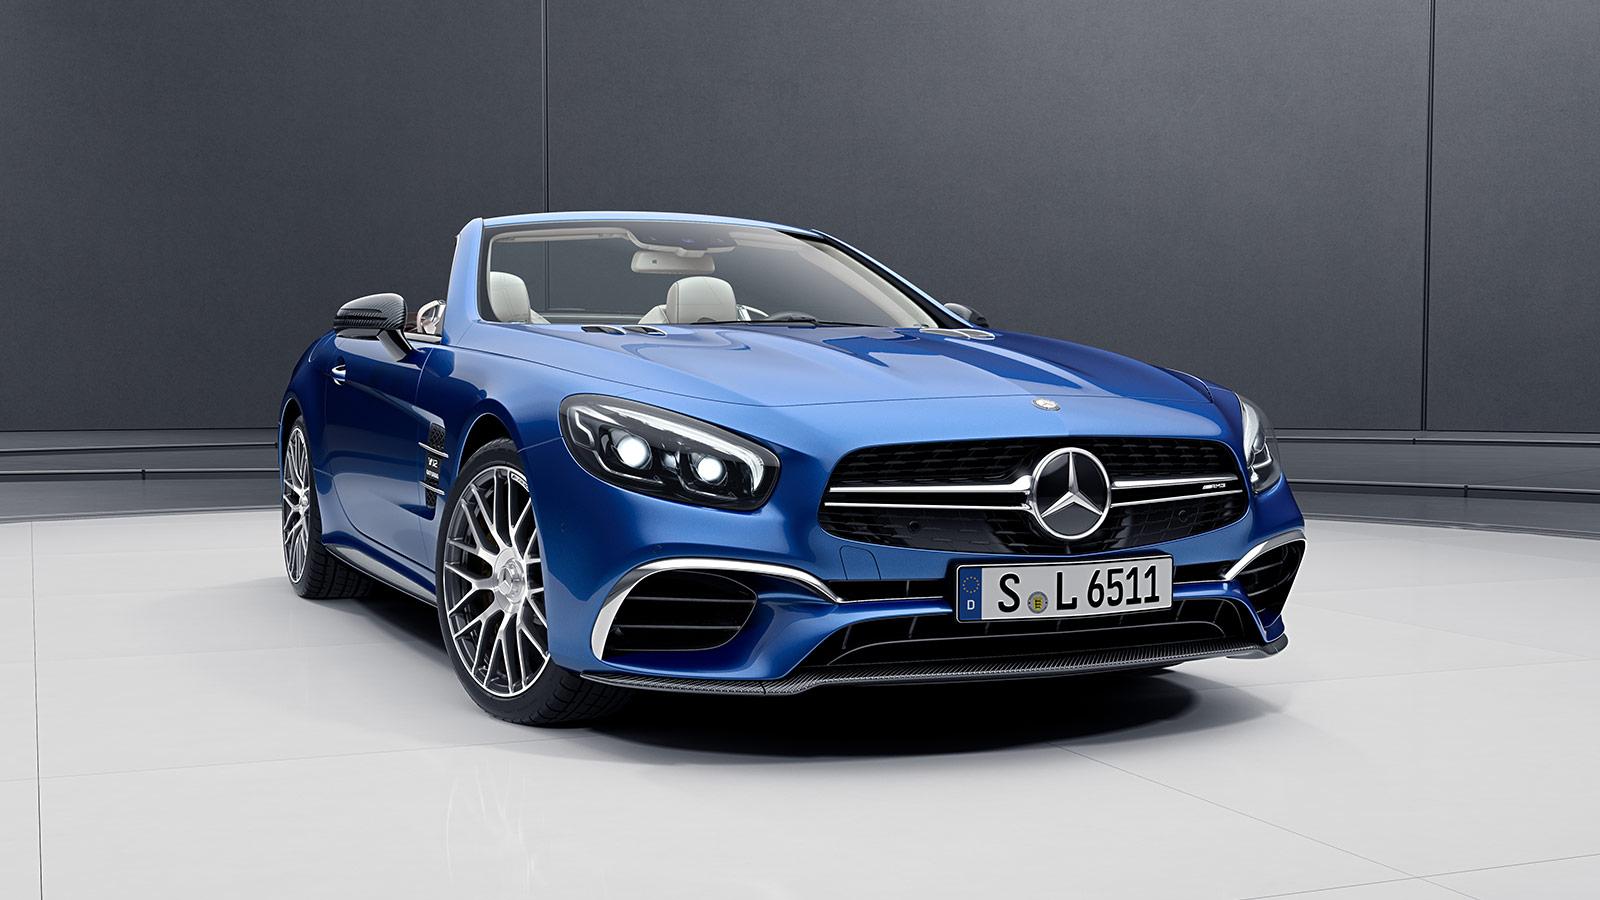 Car Features List for Mercedes-Benz SL 65 AMG 2018 6.0L ...